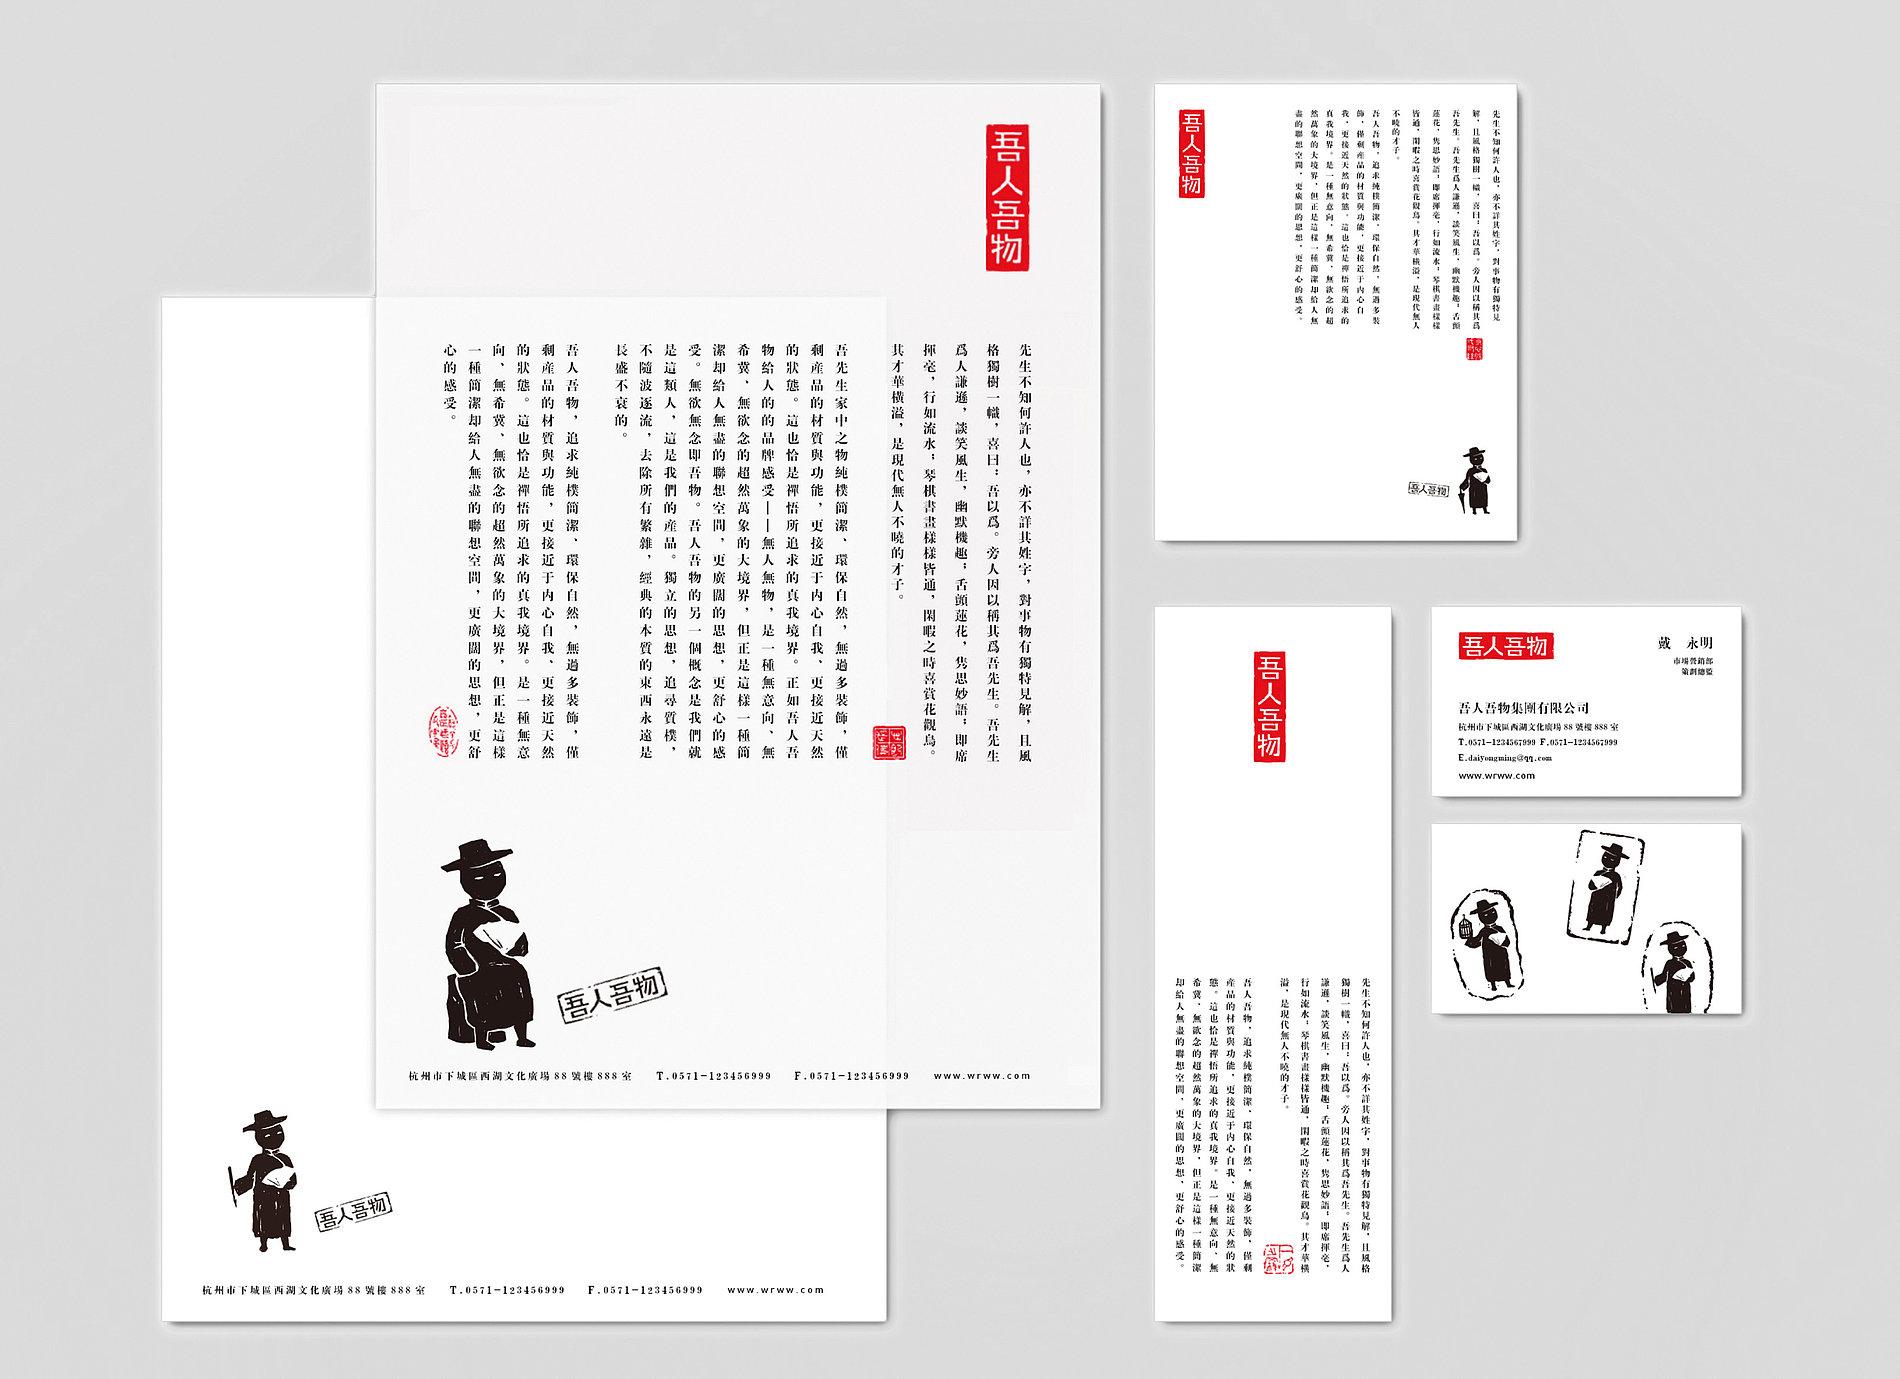 Mr Woo | Red Dot Design Award